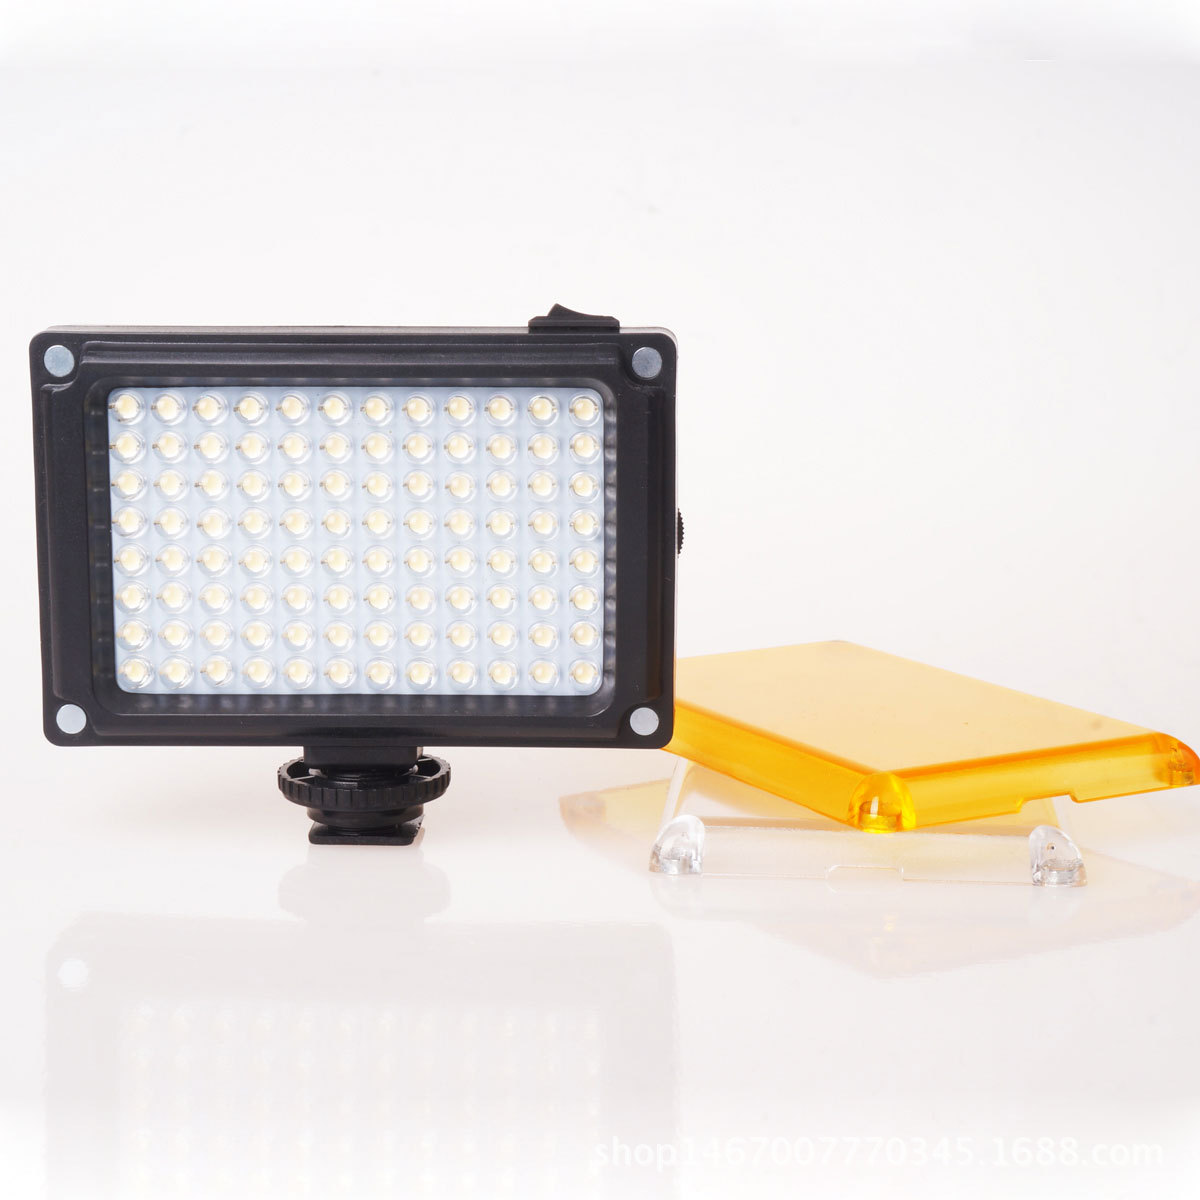 by dhl 50pcs Flashing LED Studio LightS Good Quality Dimmer Bi color Profession LED Photo Studio